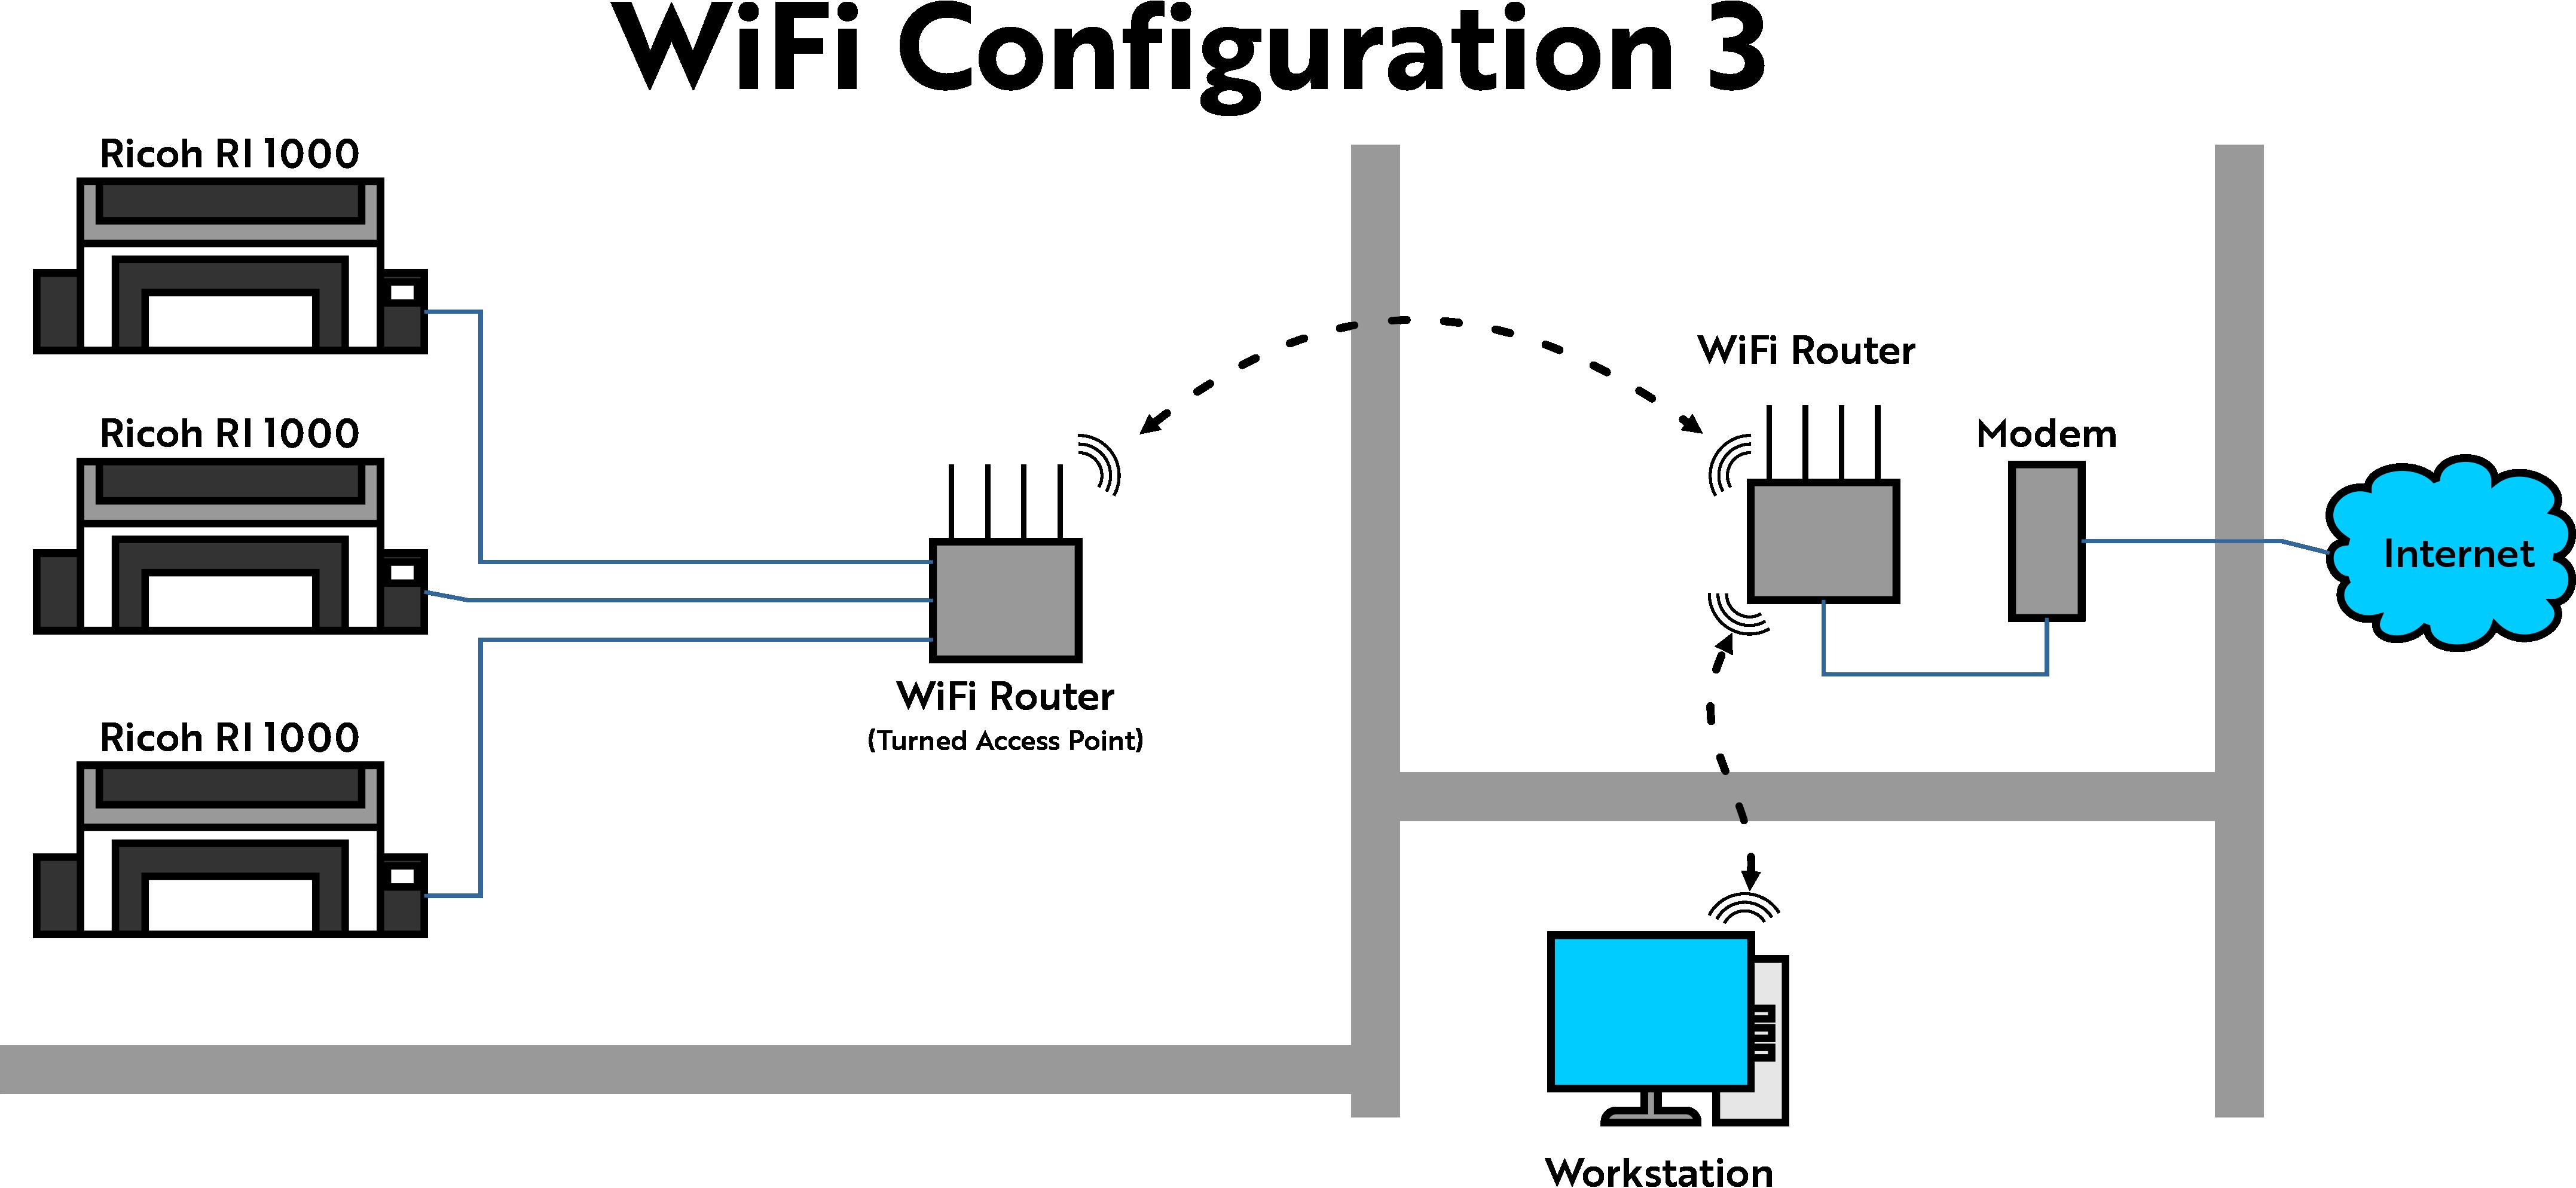 WiFi Network Configuration 3